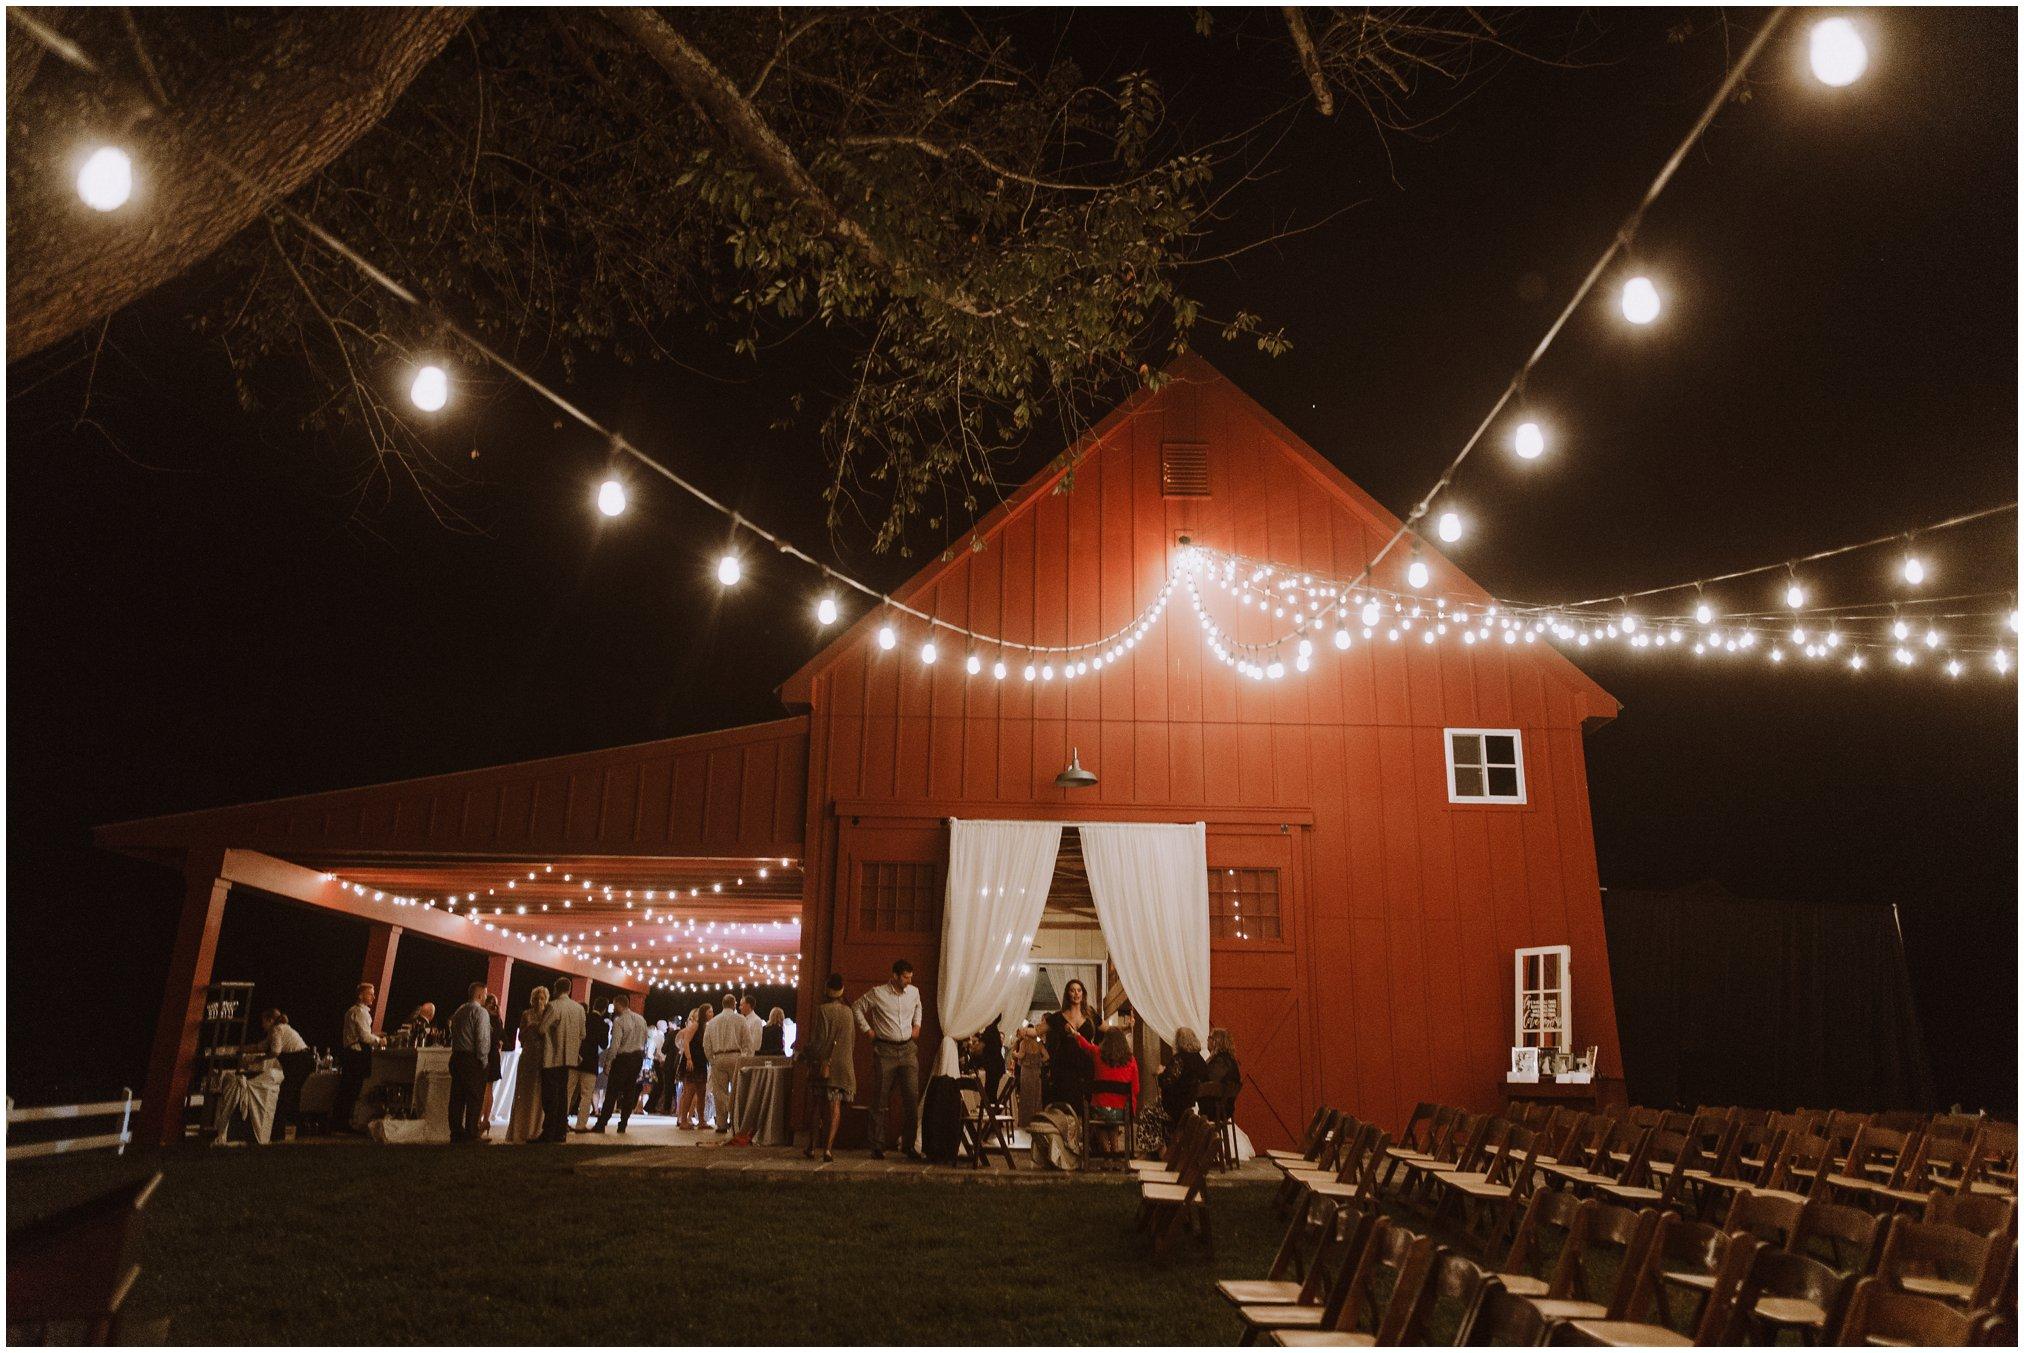 Annapolis Wedding Photographer, Kate Ann Photography, Timberlake Farm, Timberlake Farm Wedding, Annapolis Bride, Earthy Farm Wedding, Boho Farm Wedding, Outdoor Wedding Reception, Red Barn Wedding